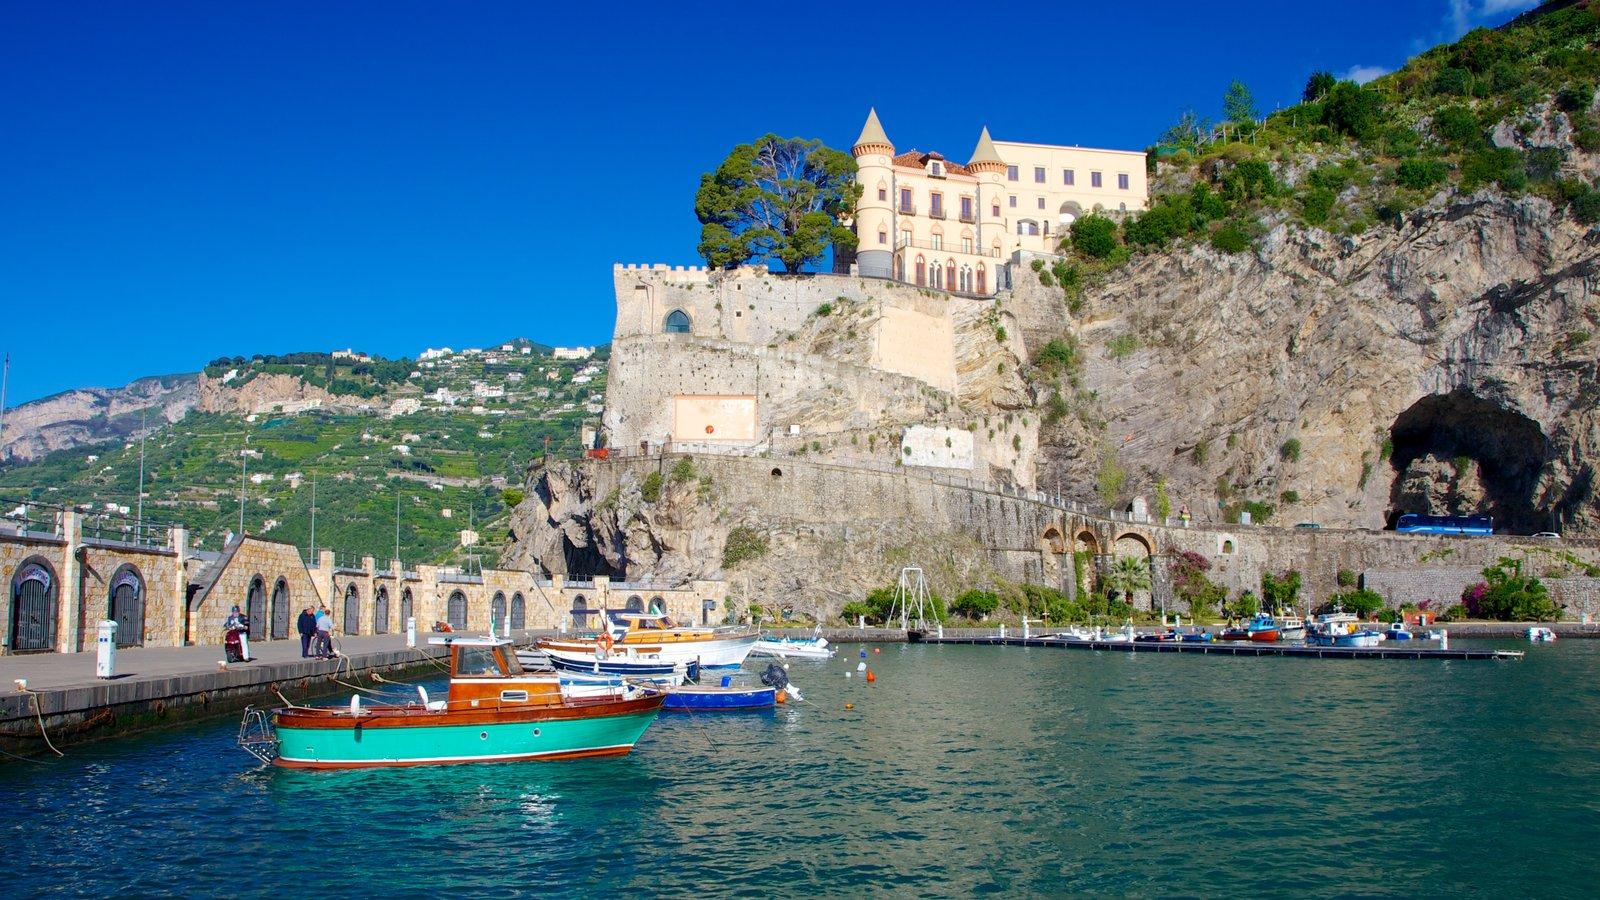 Maiori showing a coastal town, boating and general coastal views